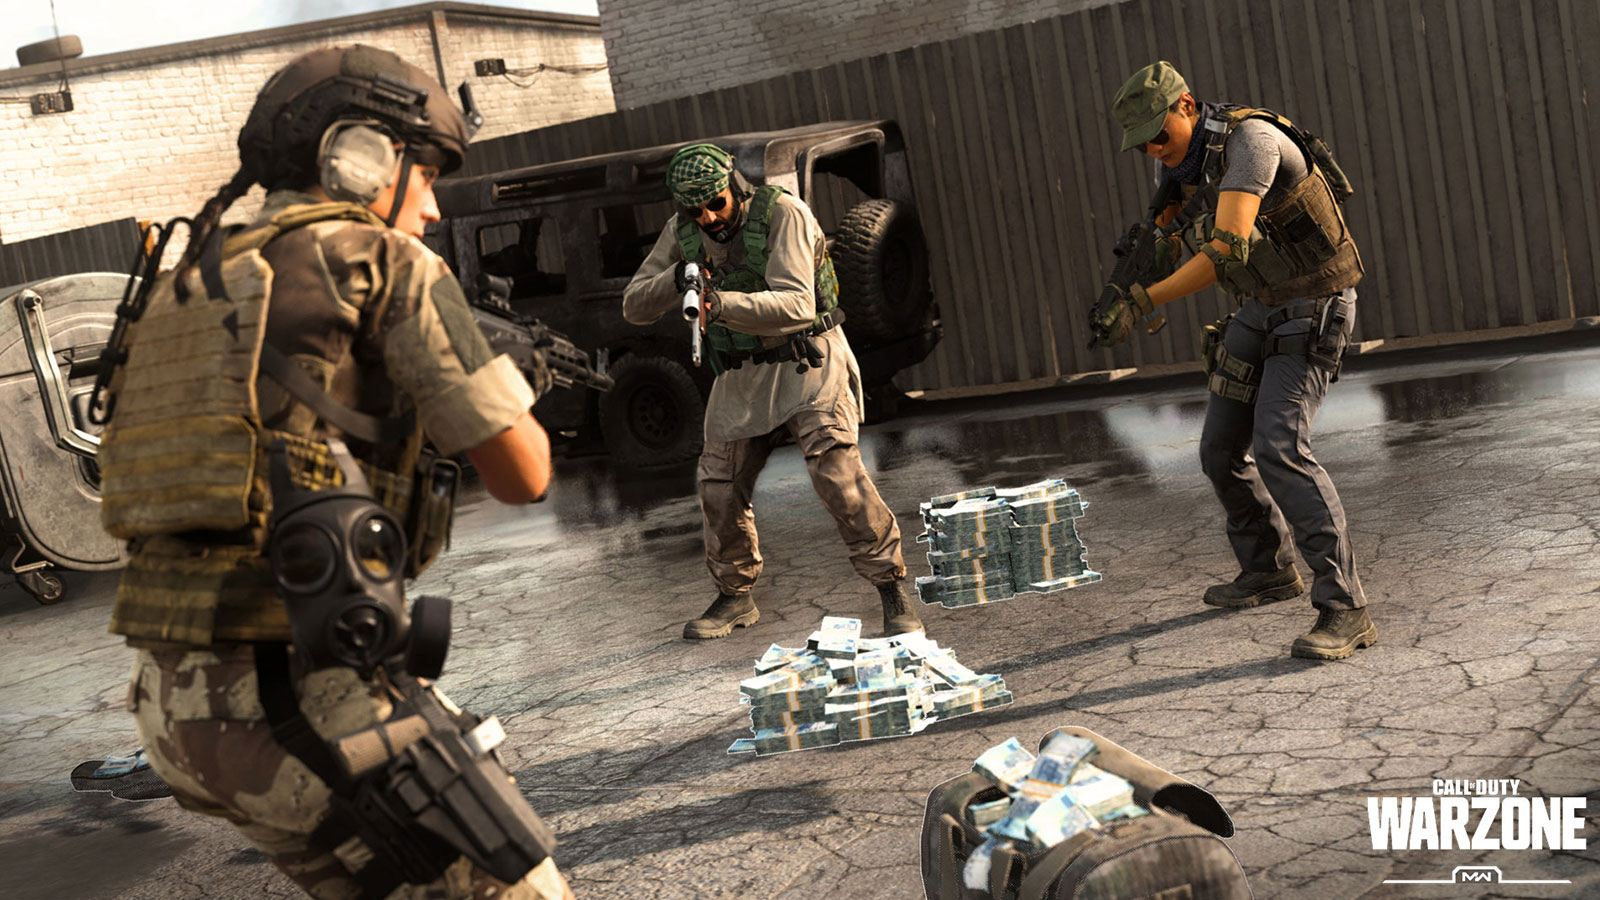 Warzone mode pillage Activision Infinity Ward